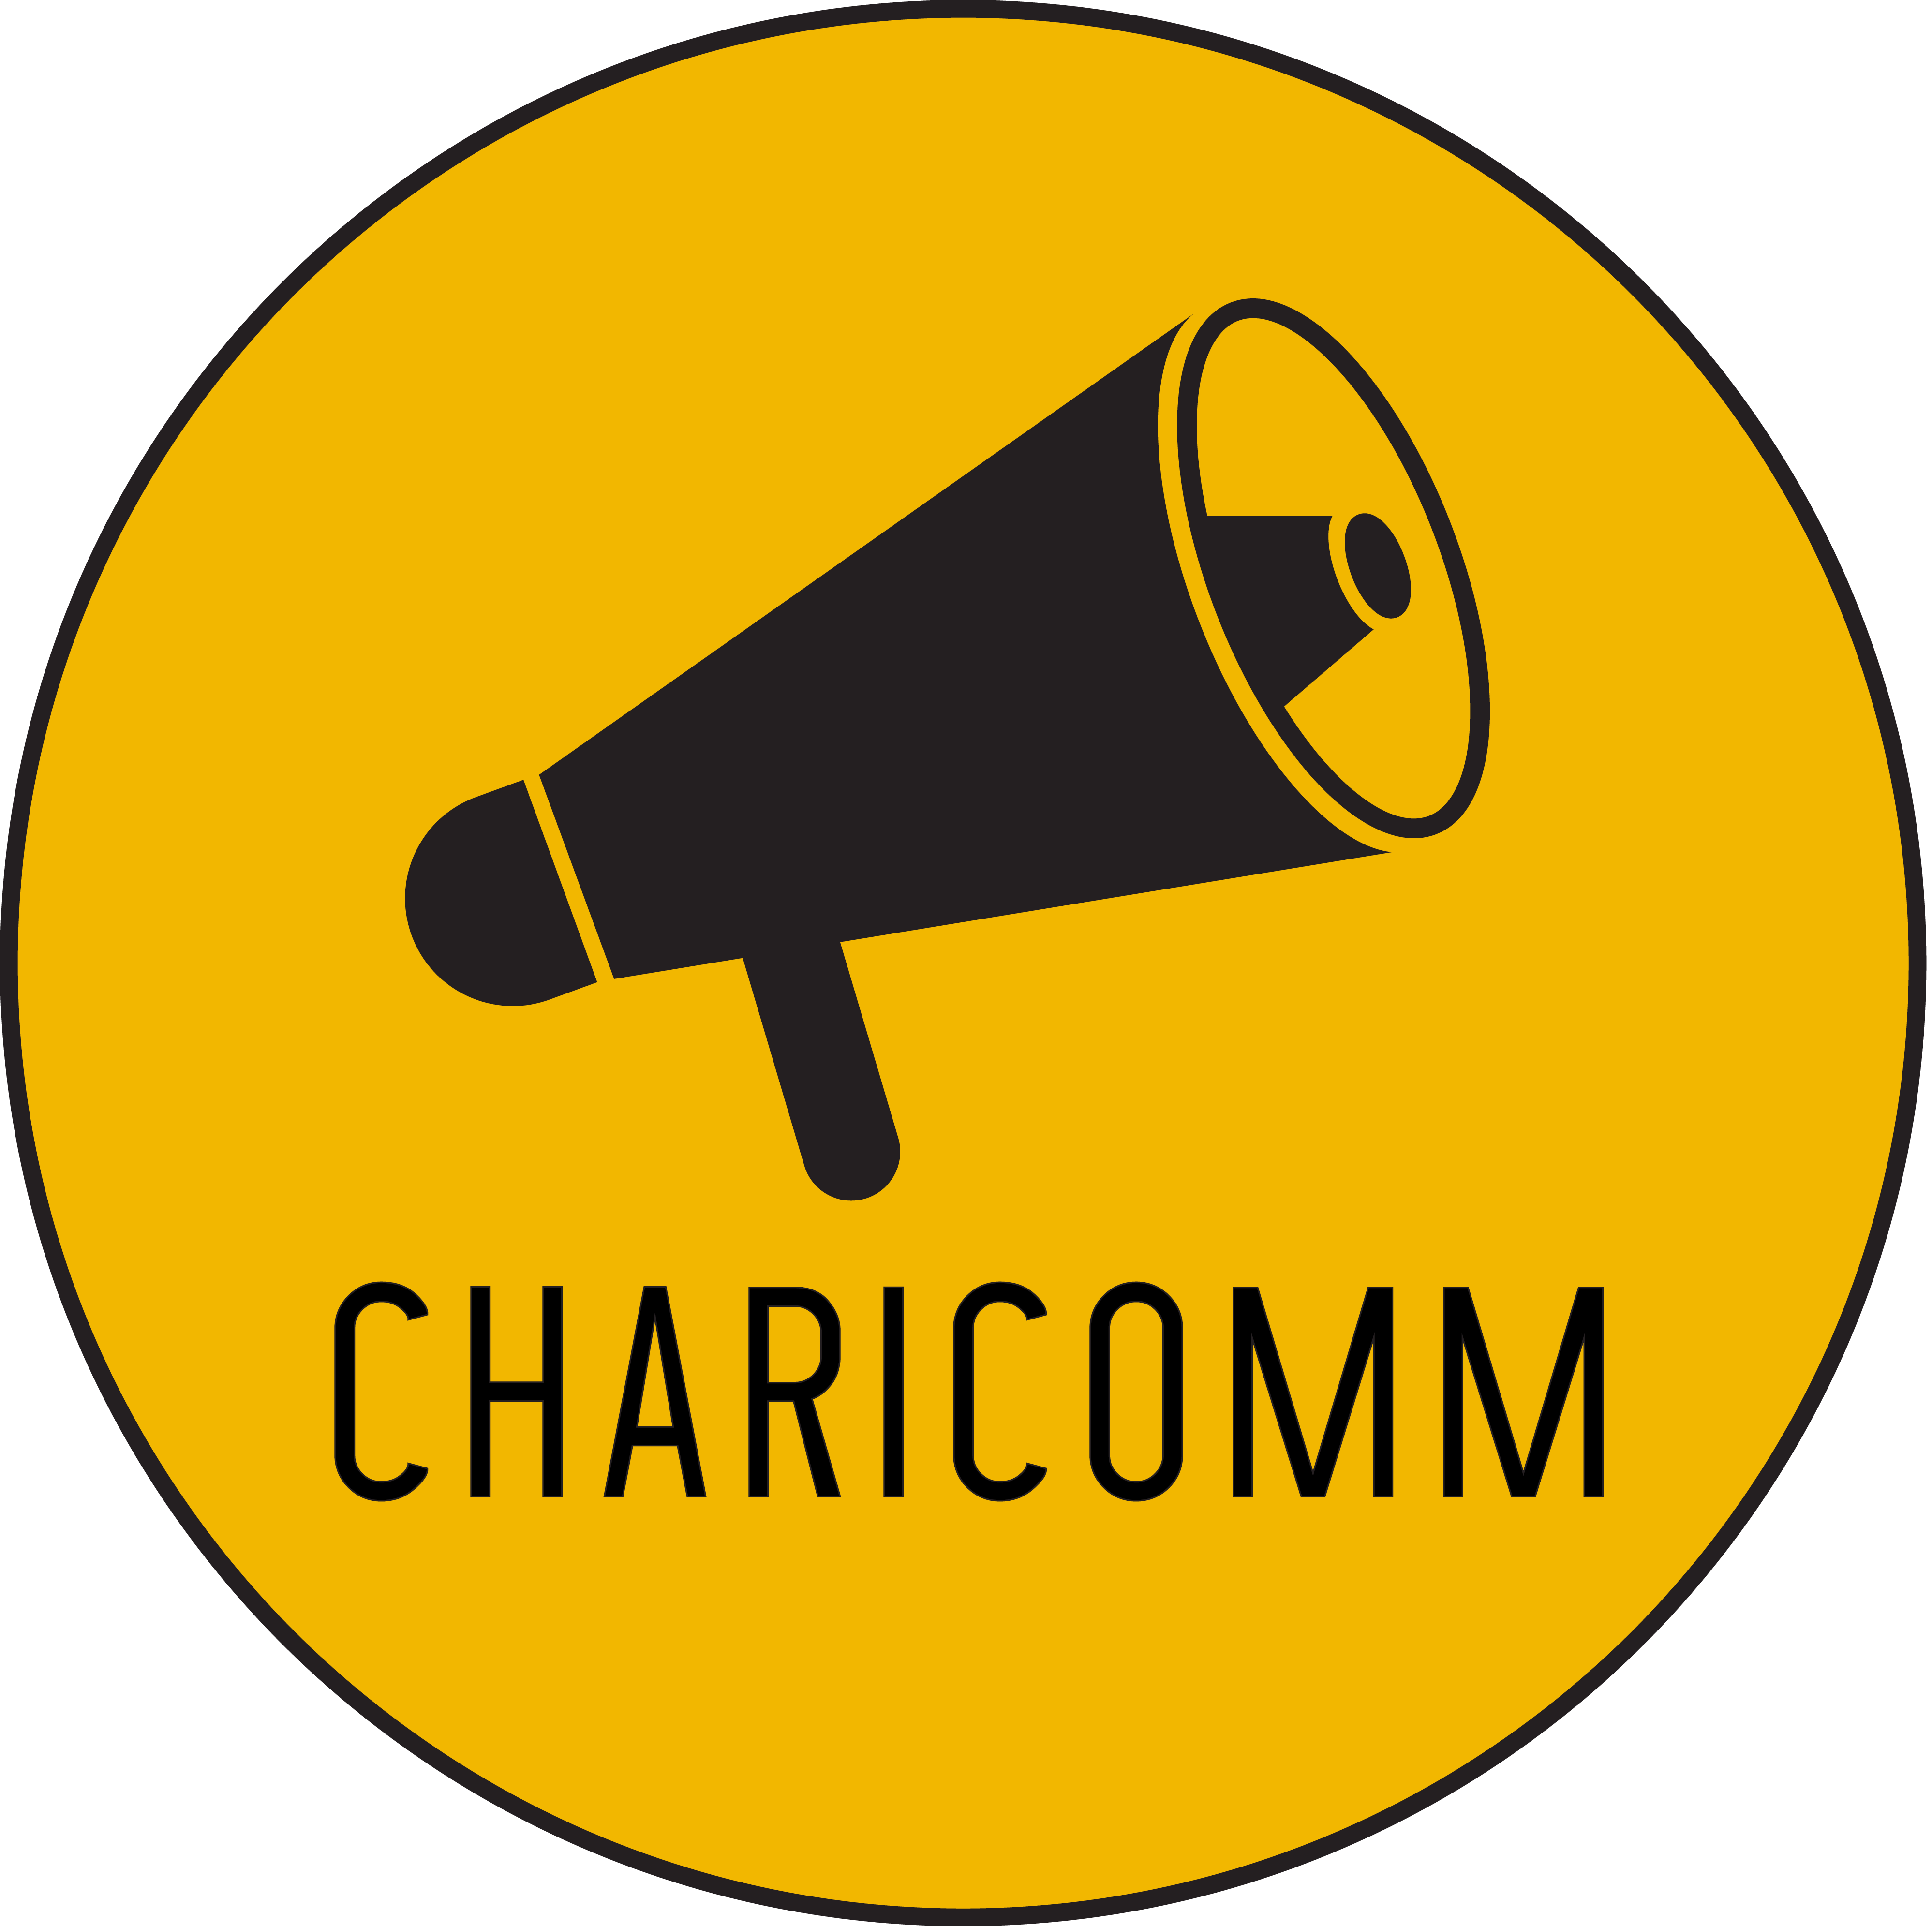 Charicomm